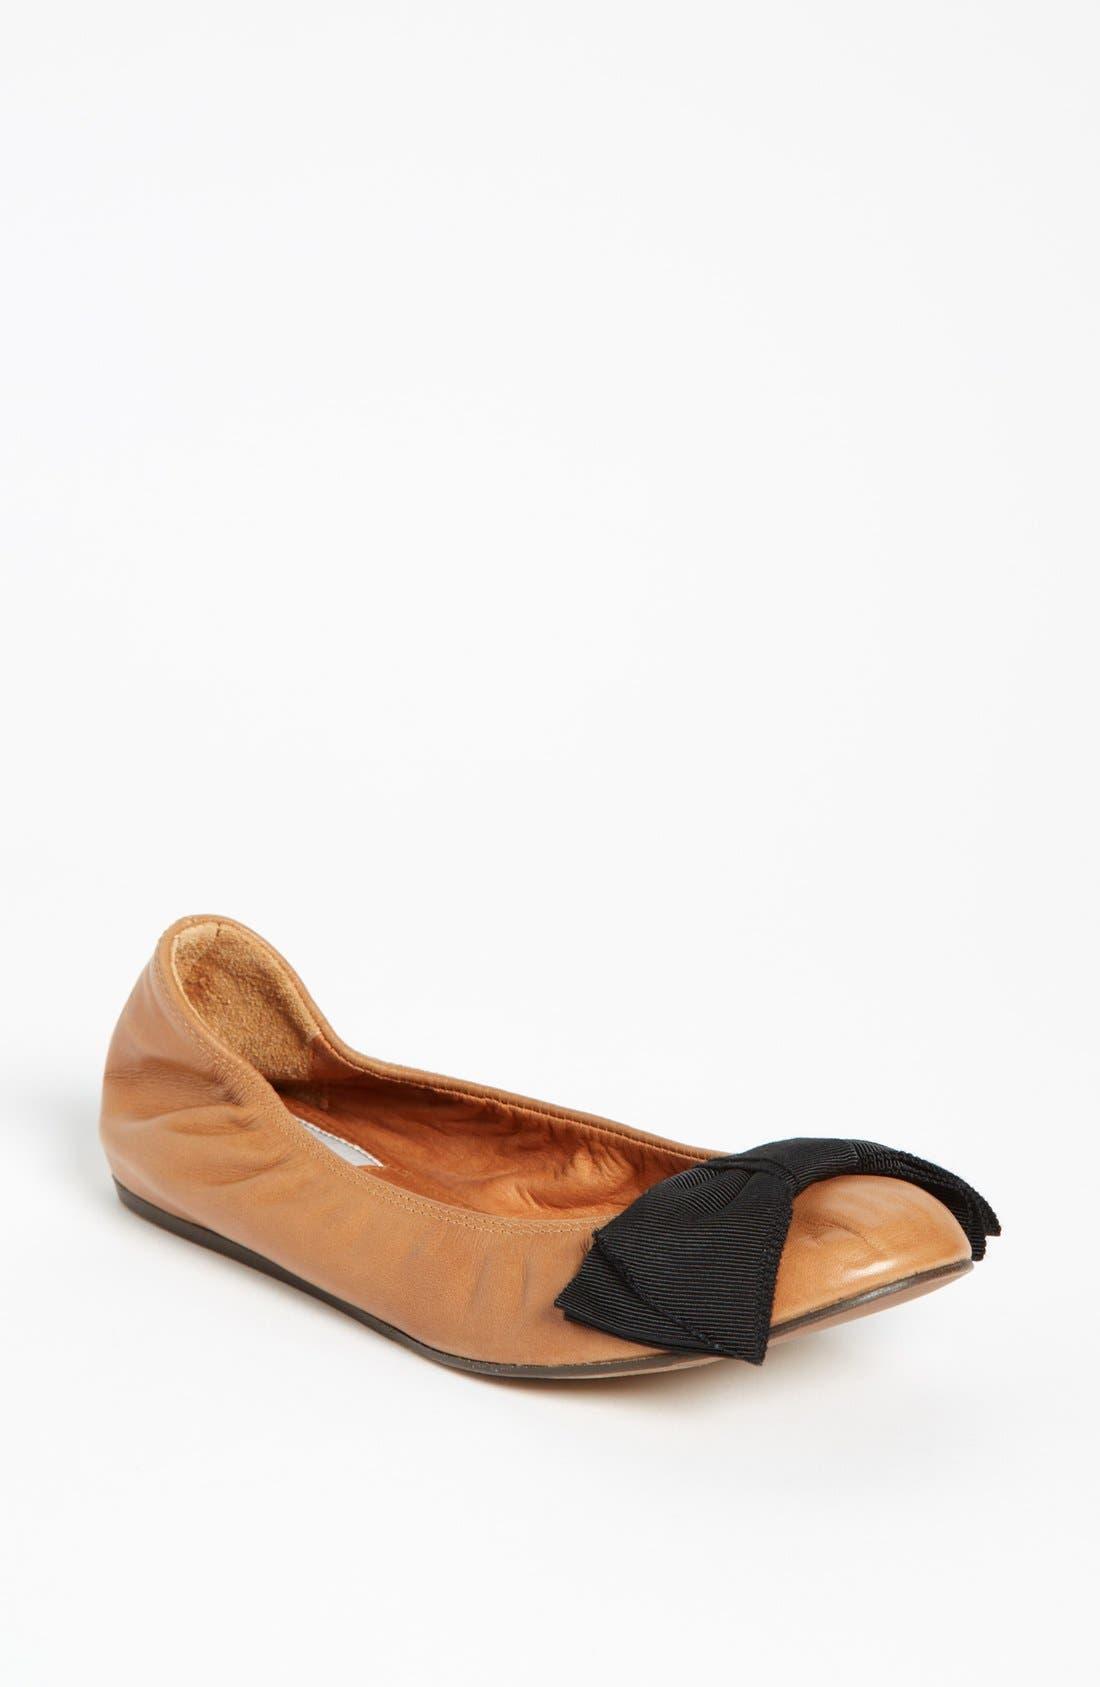 Main Image - Lanvin Bow Detail Ballet Flat